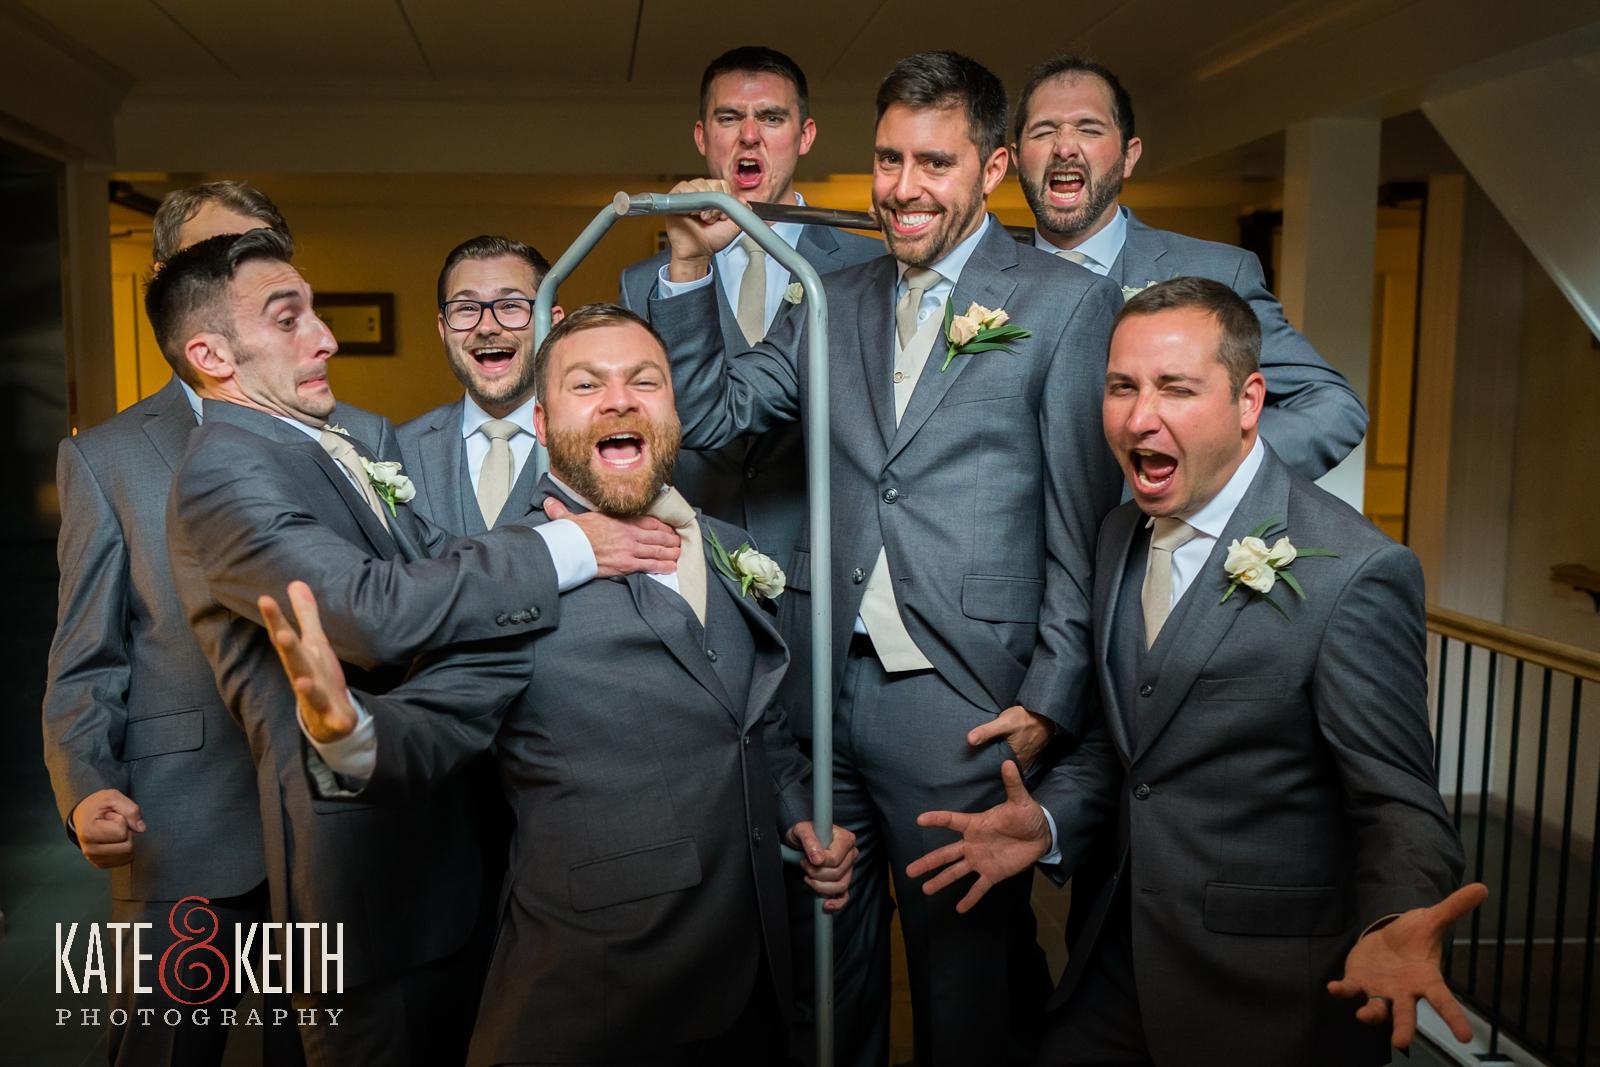 New Hampshire, Lakes Region, Lake Winnipesaukee, The Margate Resort, wedding, outdoor wedding, lakeside wedding, groom getting ready, groomsmen, groomsmens portrait, group photo, fun group photo, fun wedding portraits, silly wedding portraits